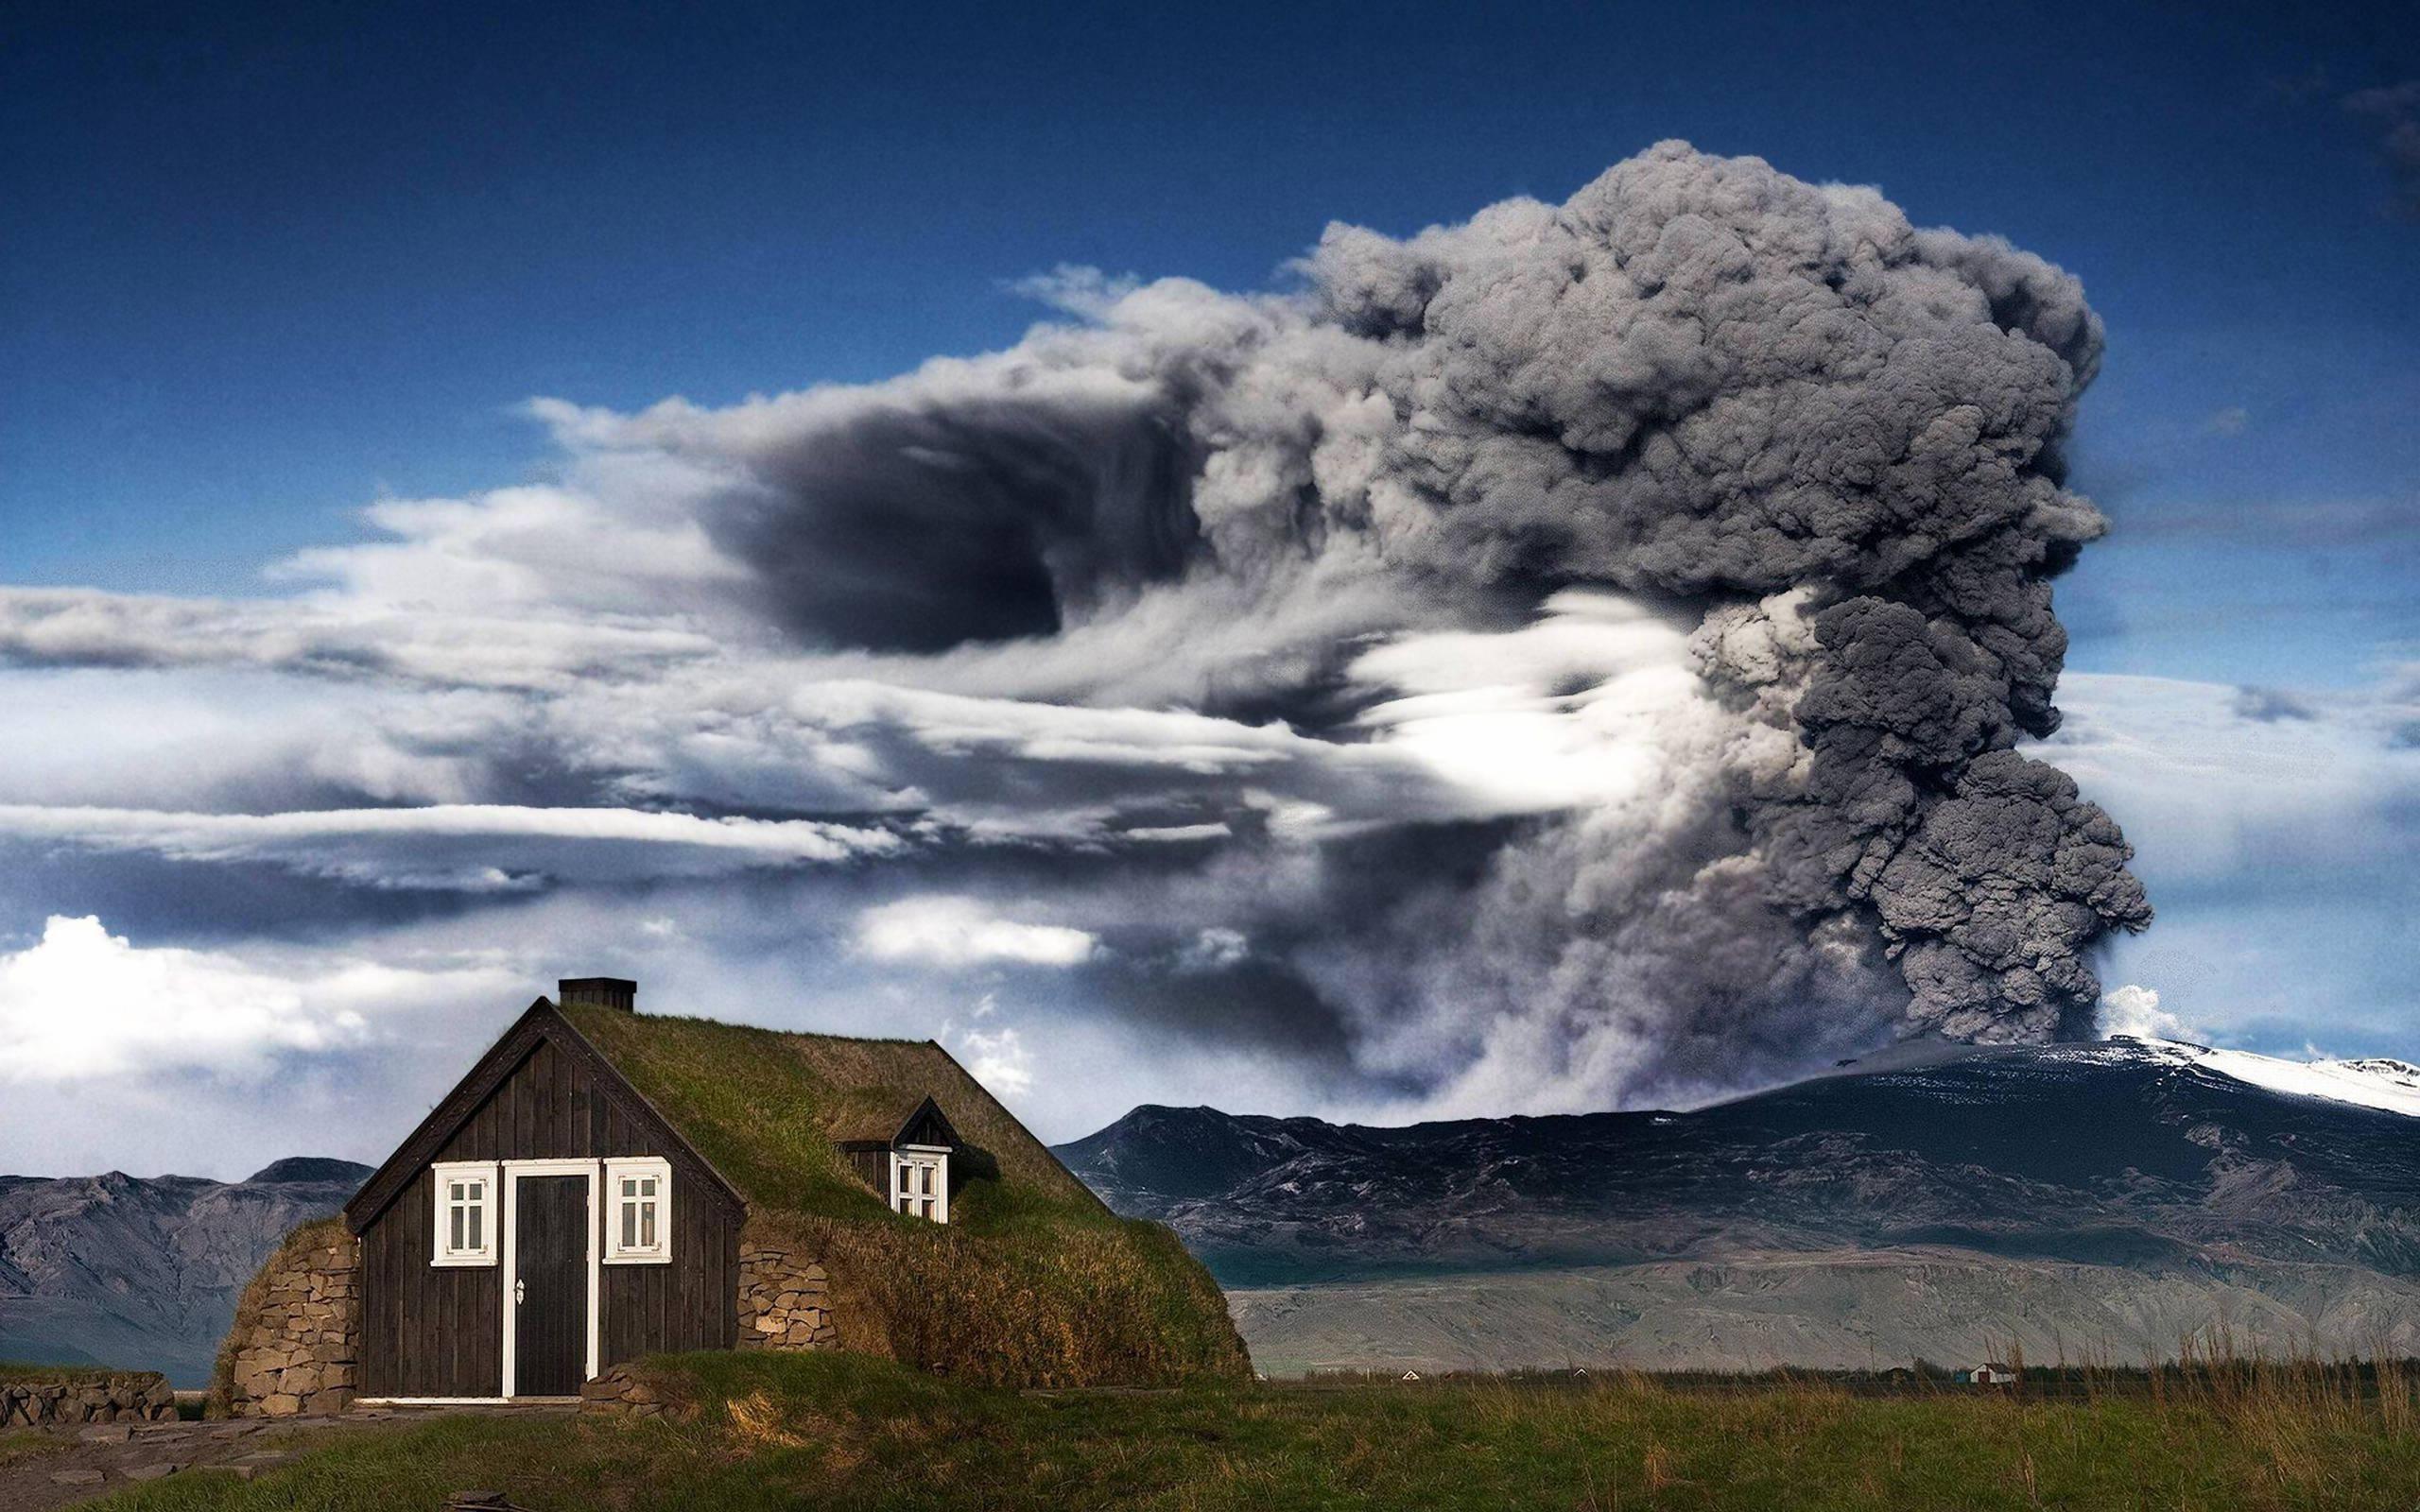 wallpaper hd volcano eruption - photo #34